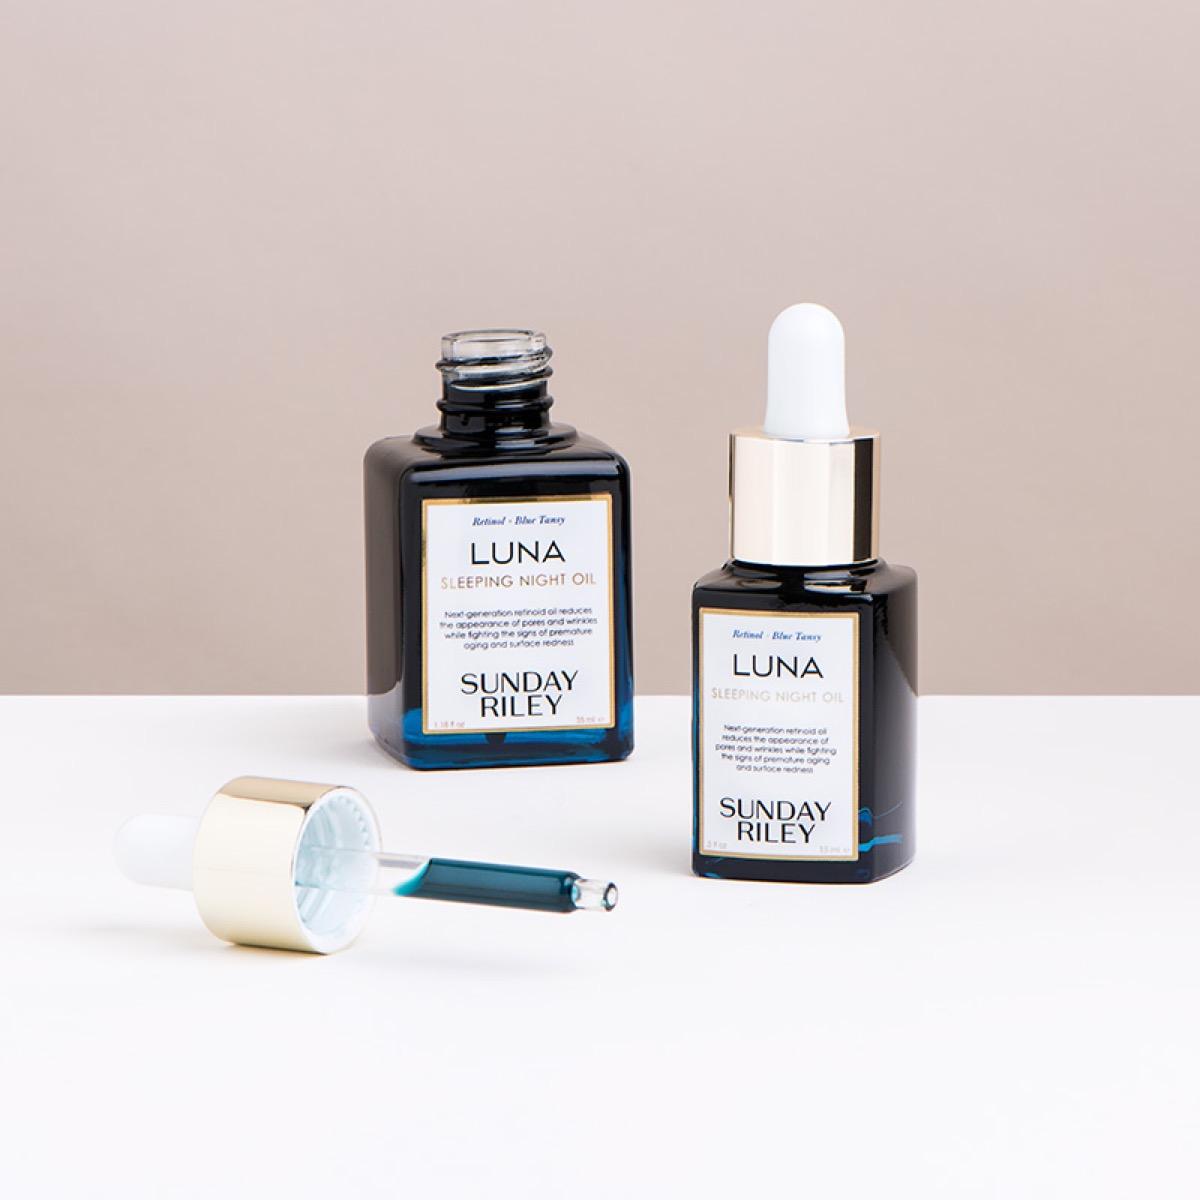 Sunday Riley Luna Sleeping Night Oil (1.18 fl oz.)